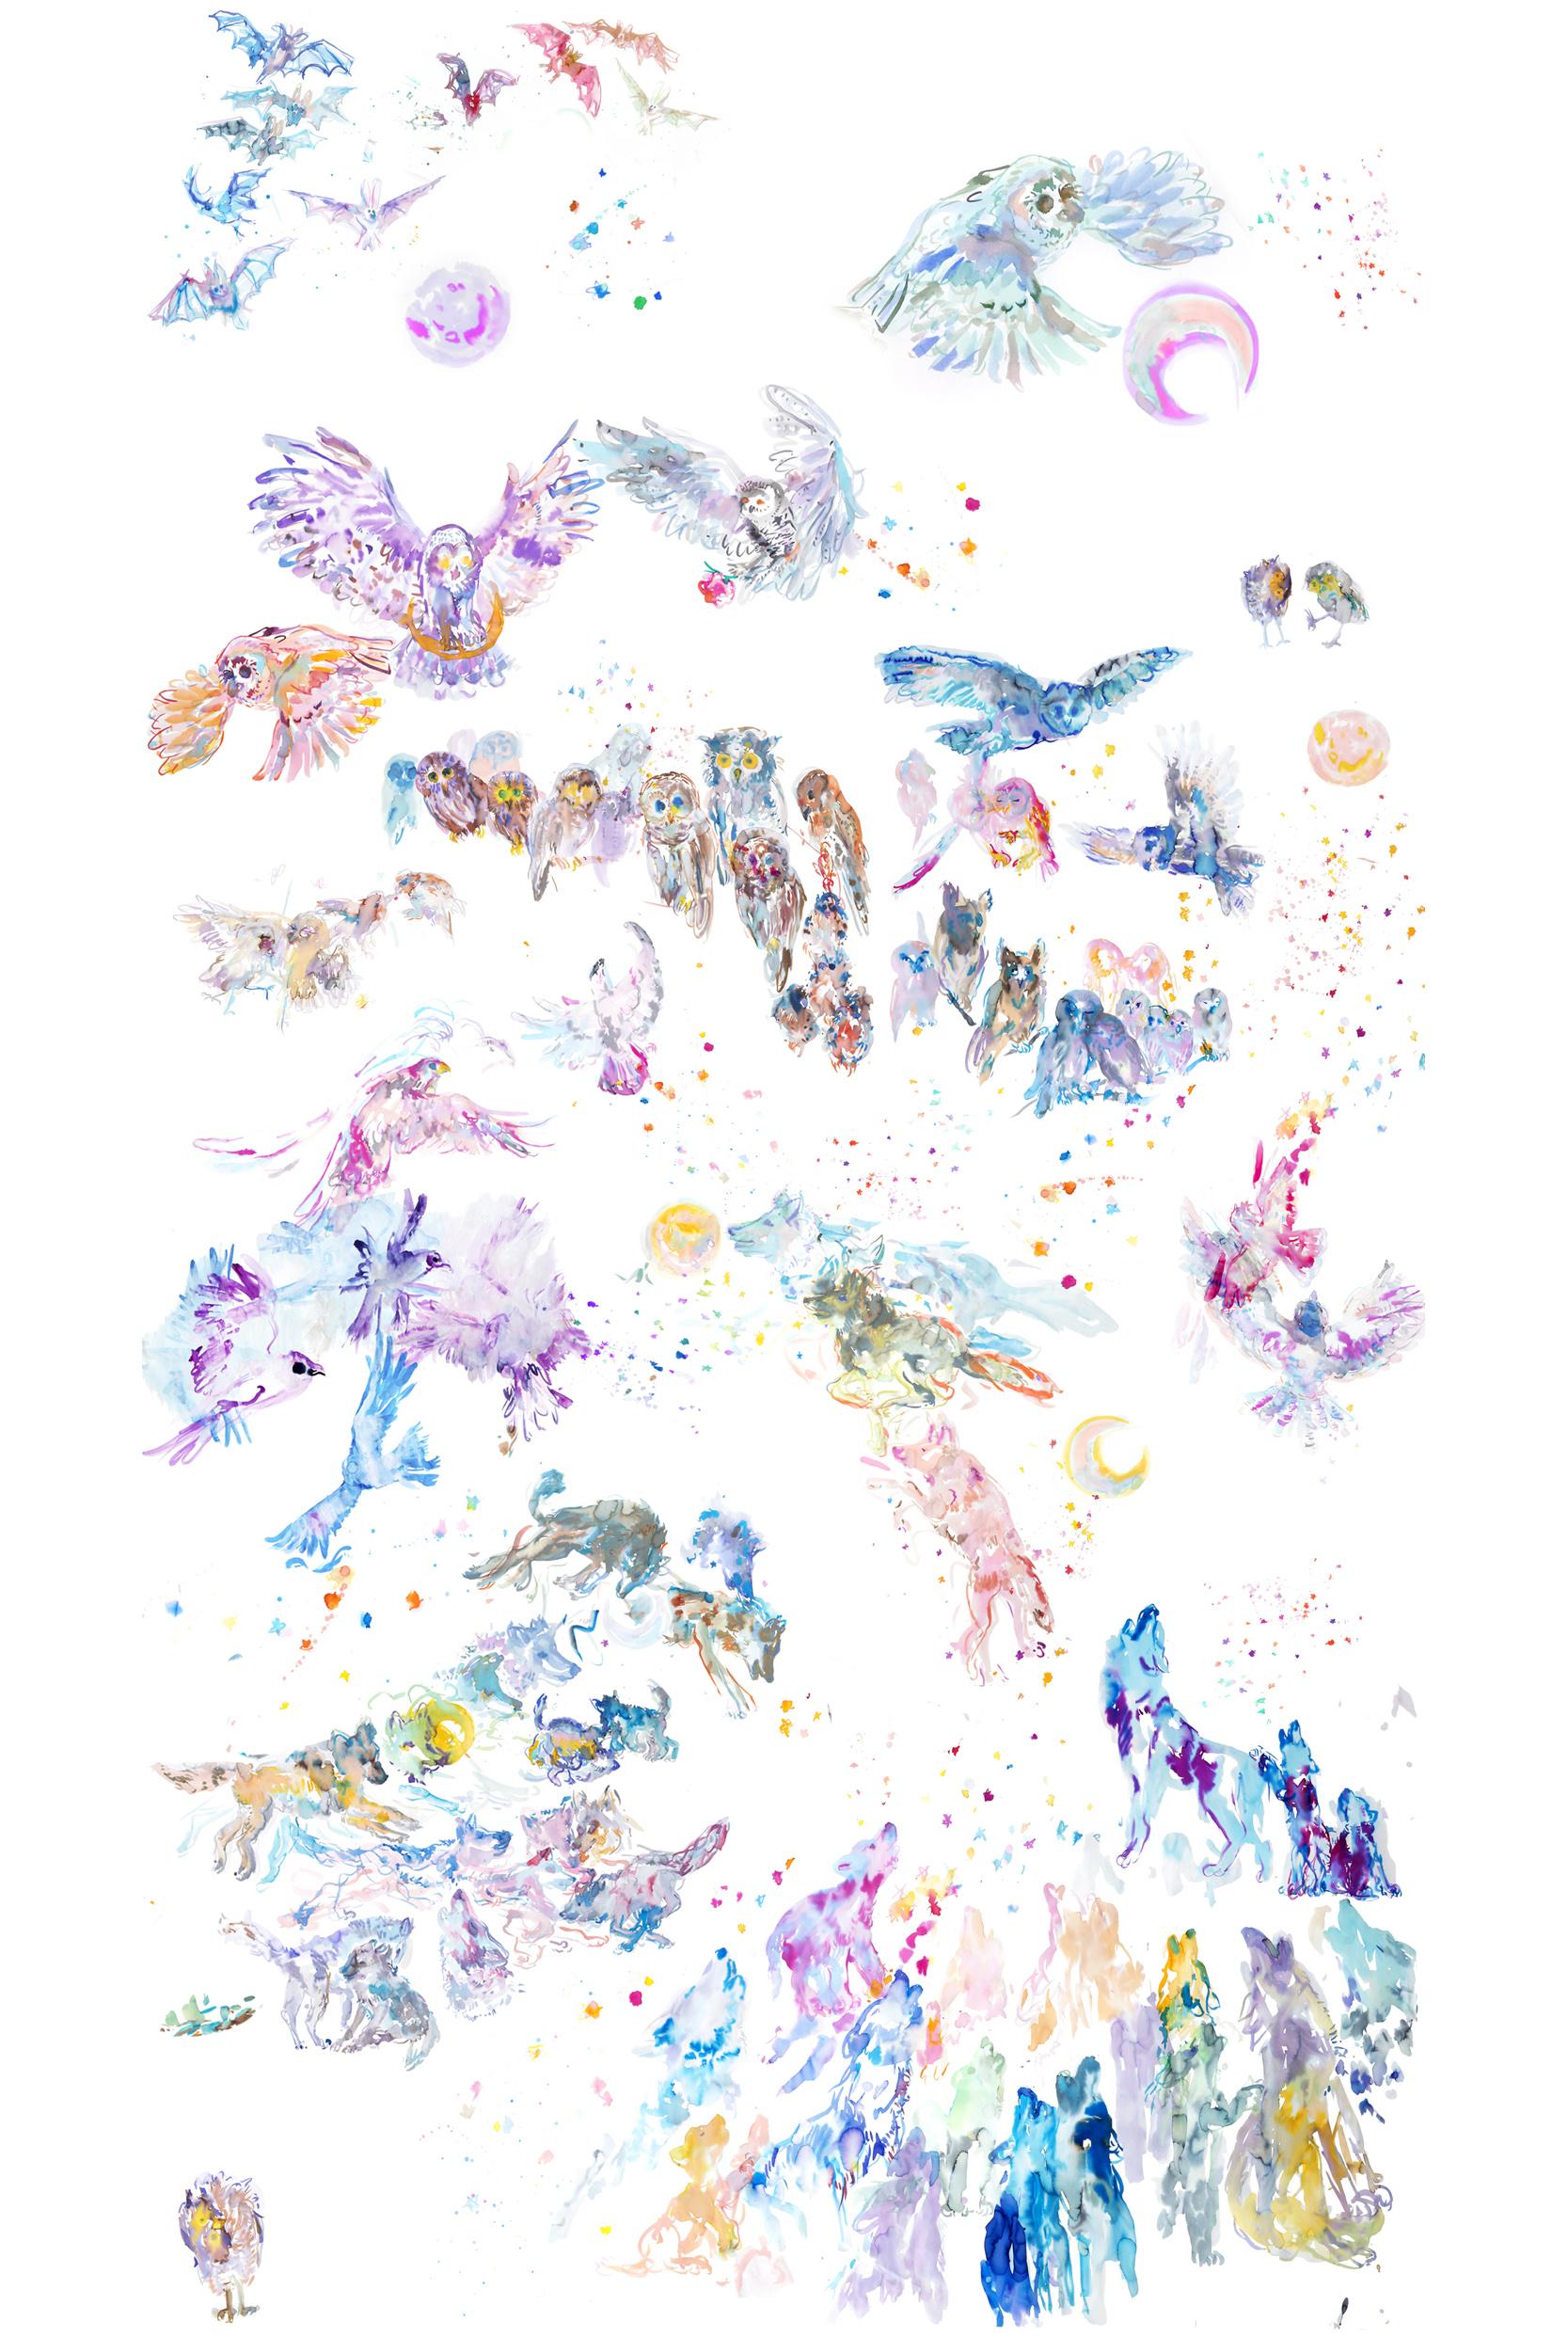 howling Mural - ARTWORK DETAILS:ARTWORK DETAILS:Fine Art print of original watercolor painting.Limited editionWidth: 111 cm (approx 44